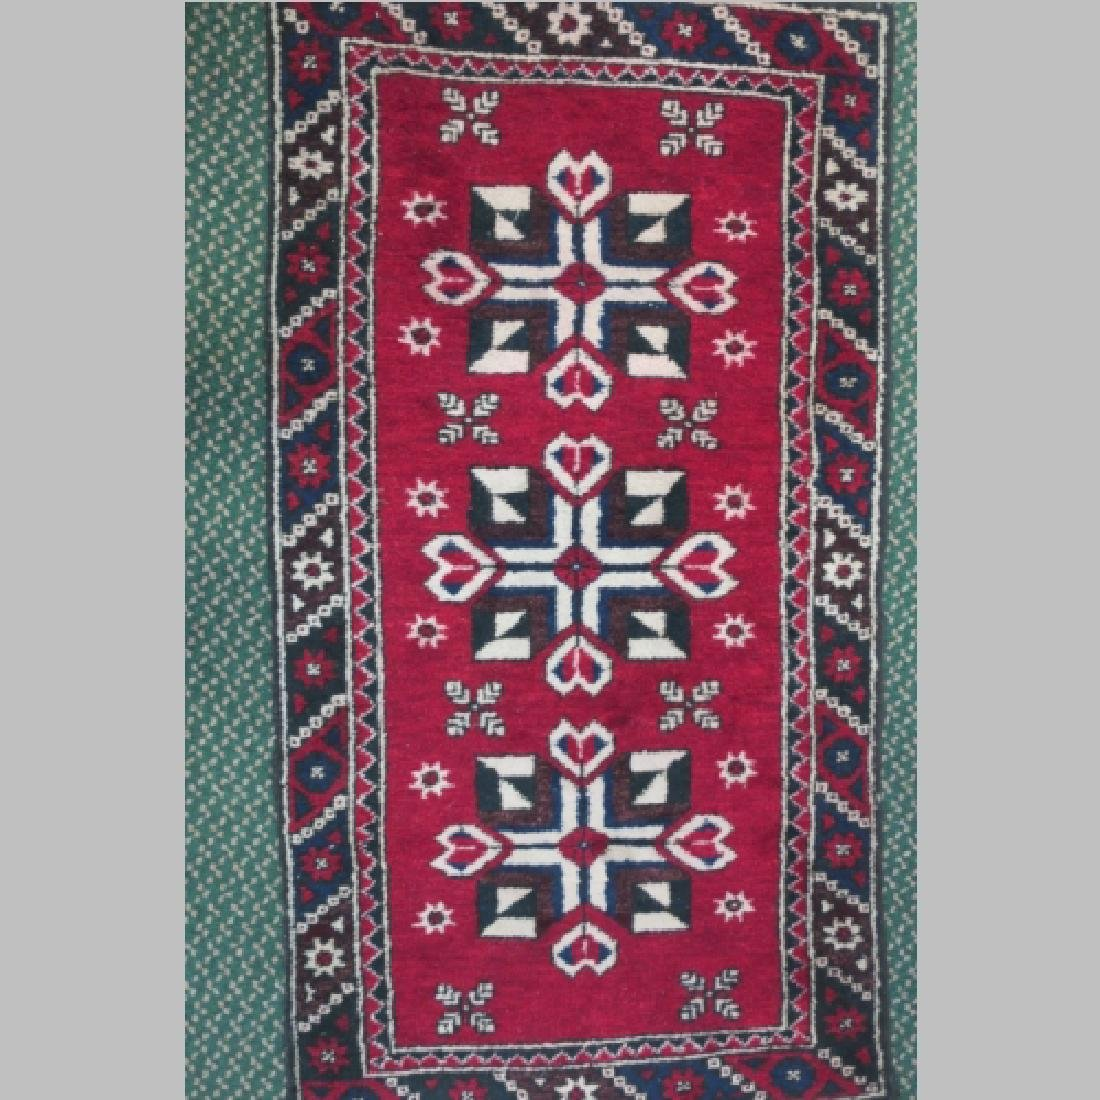 Handwoven Wool Iranian Area Rug: - 2